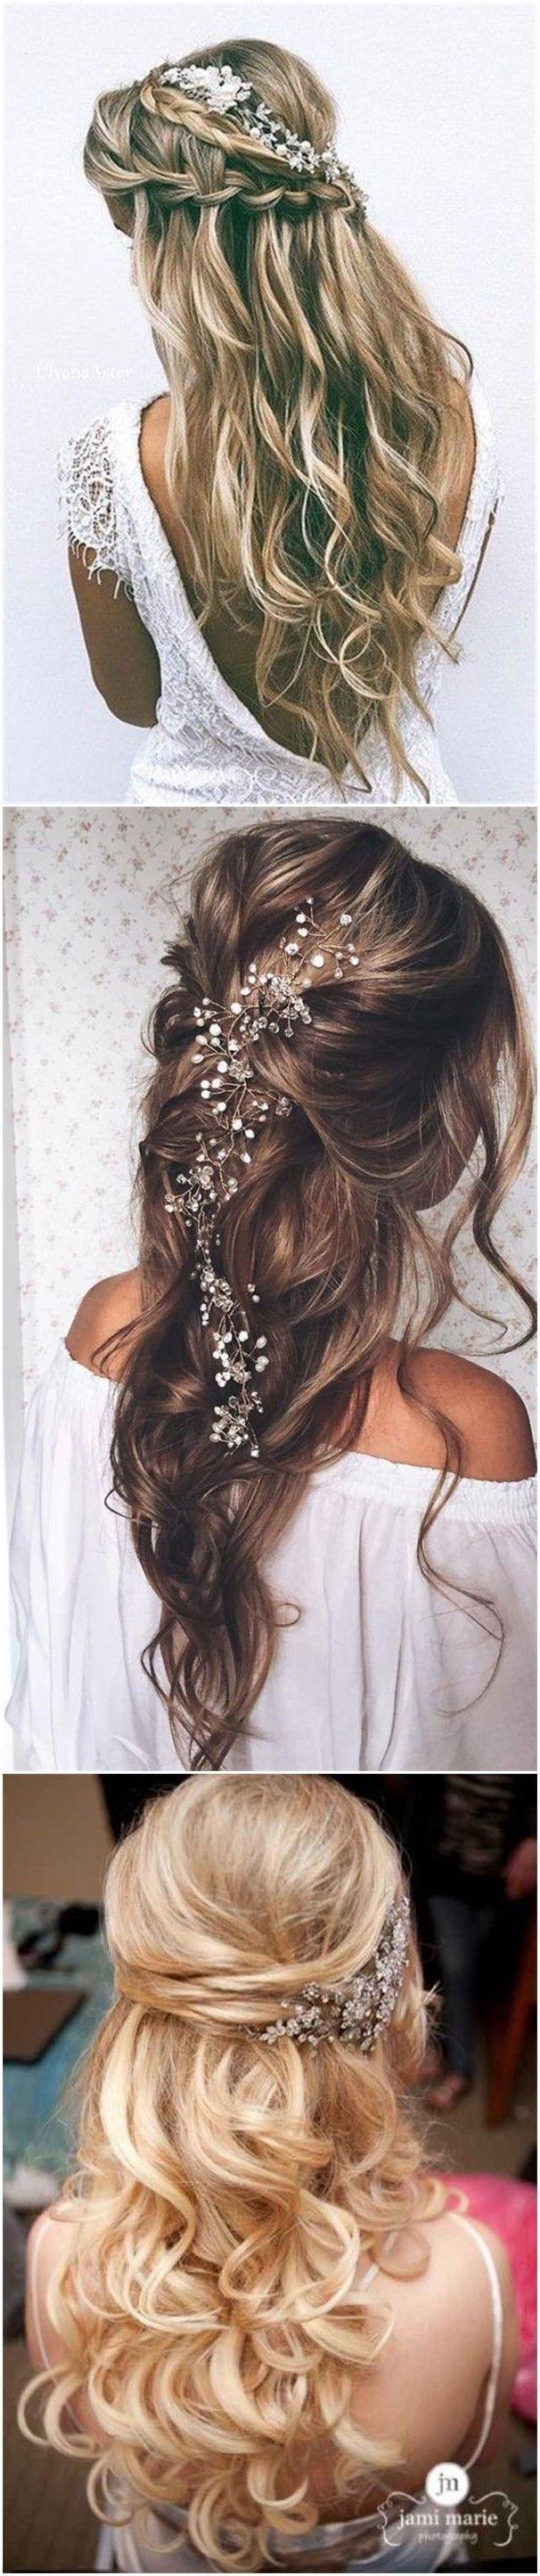 best 25+ hair accessories for brides ideas on pinterest | uk